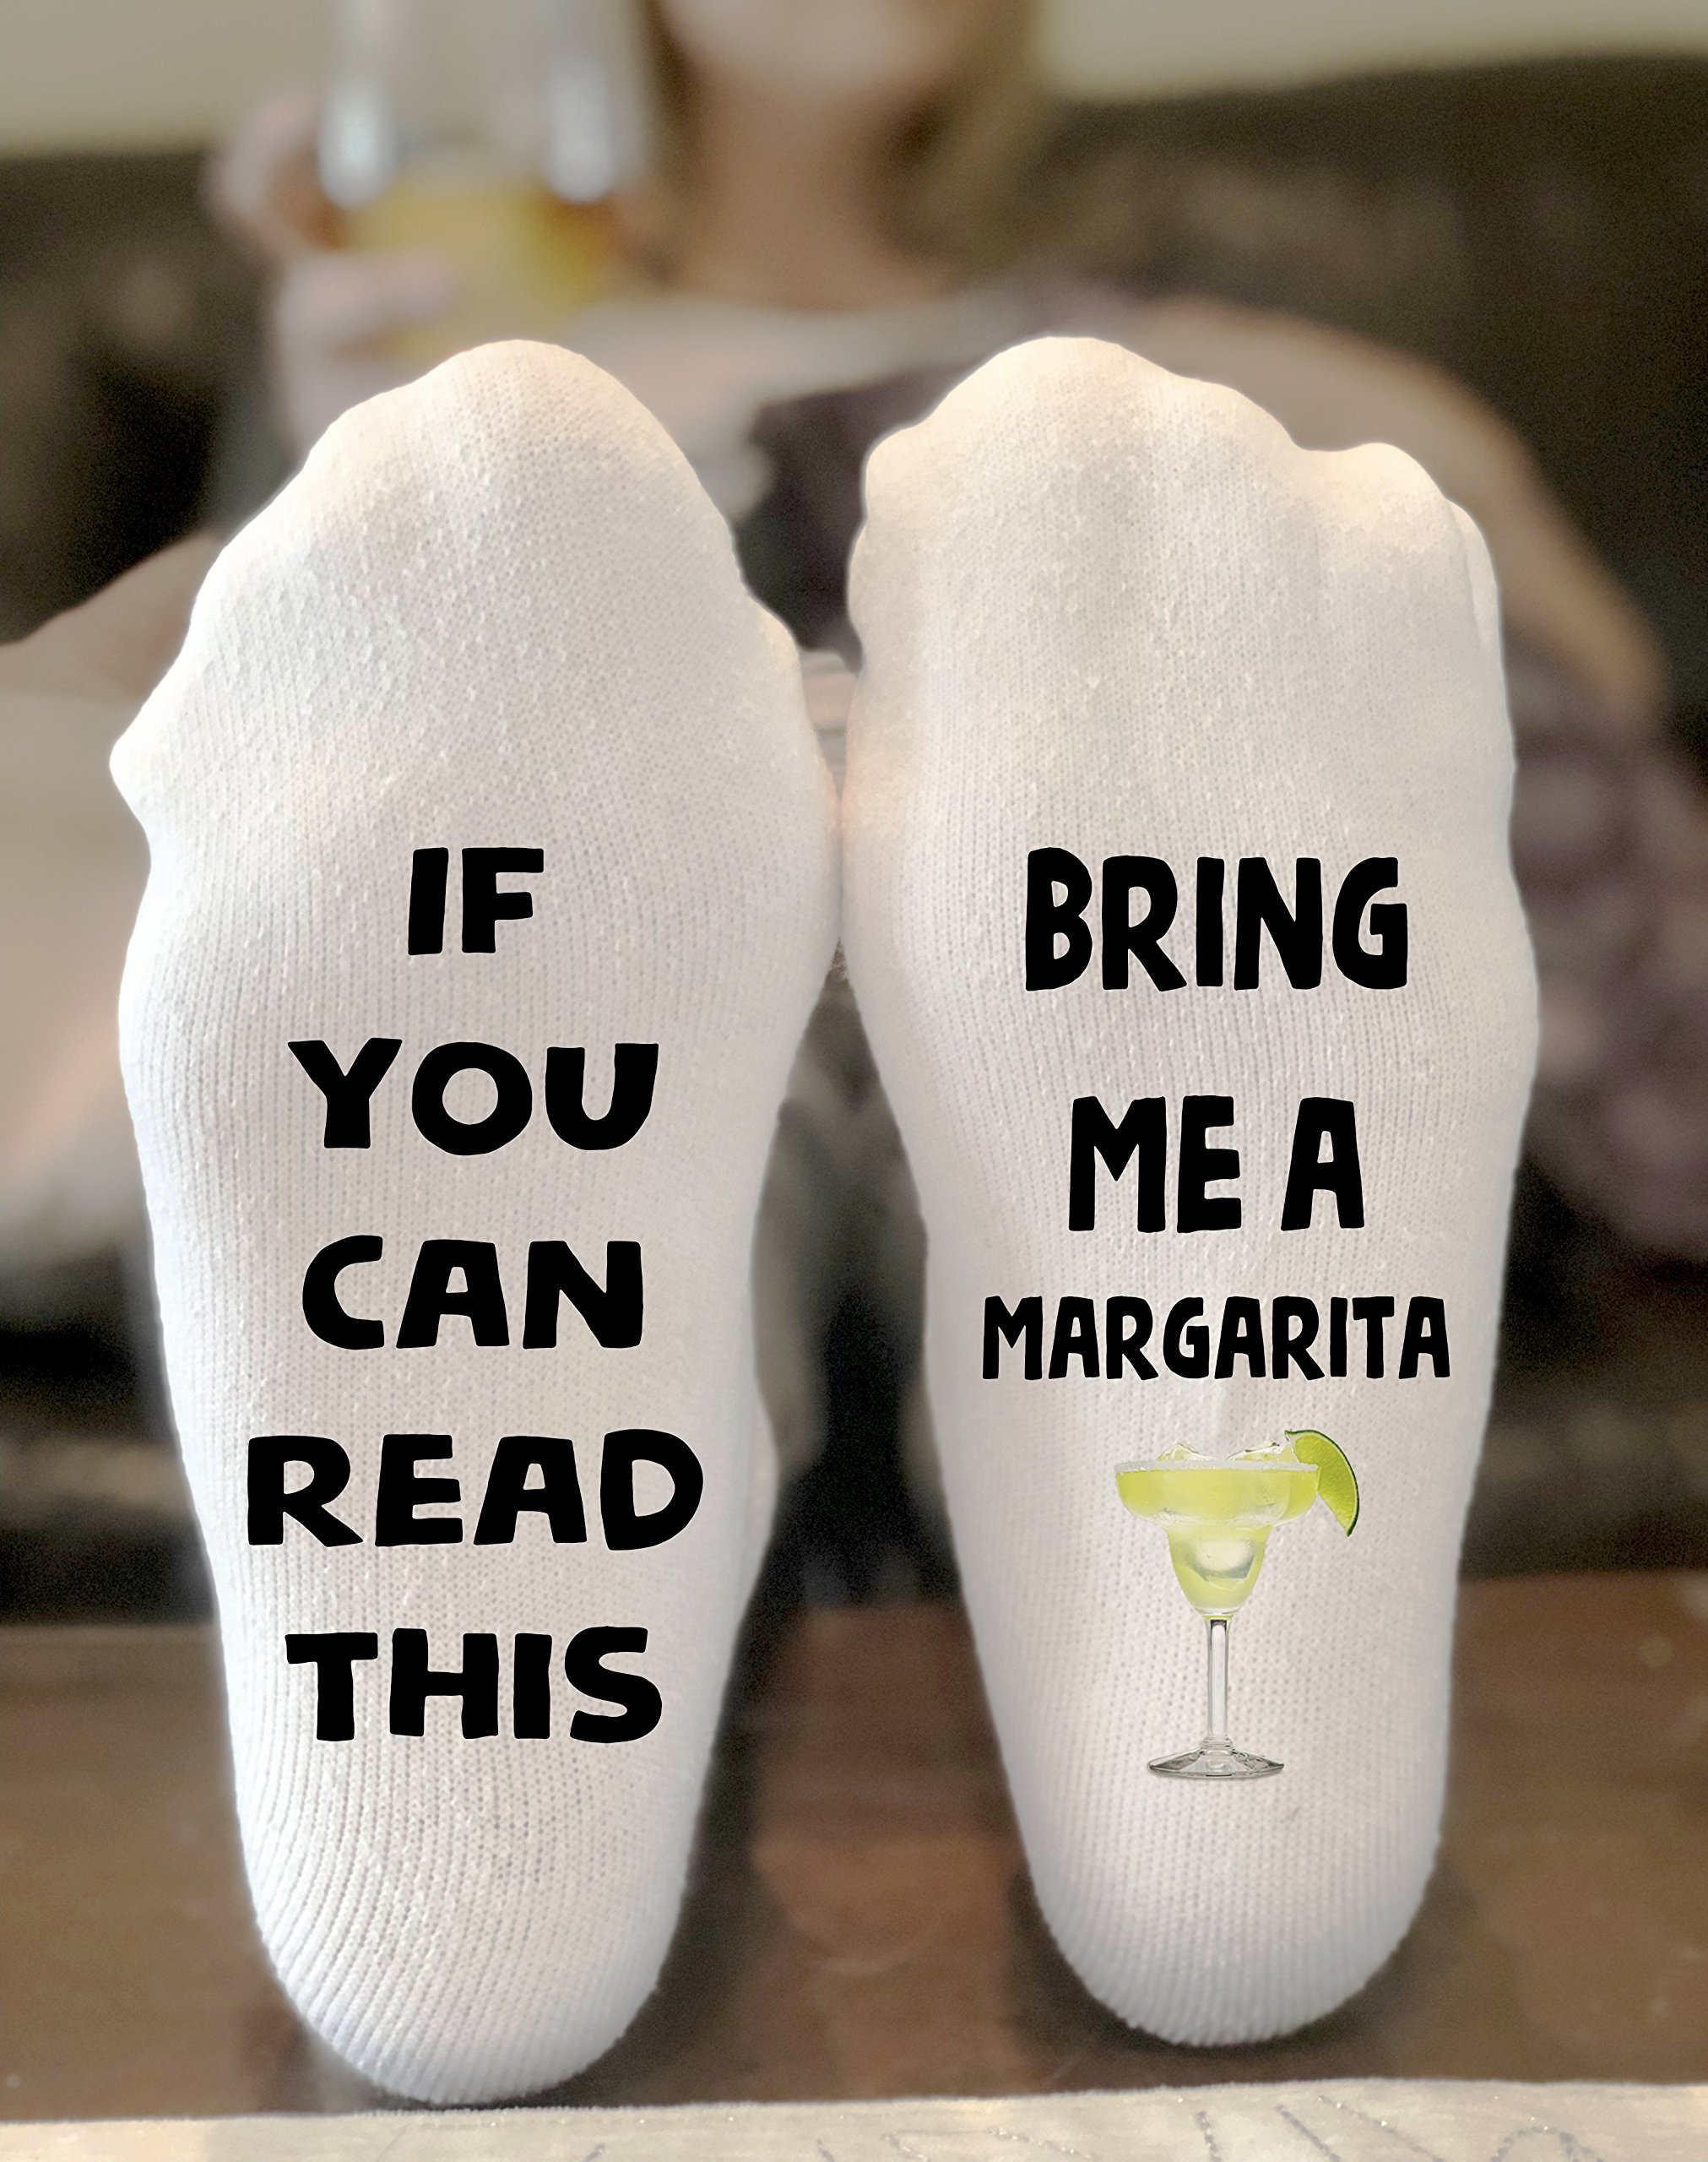 If You Can Read This Bring Me A Margarita Socks Novelty Funky Crew Socks Men Women Christmas Gifts Cotton Slipper Socks